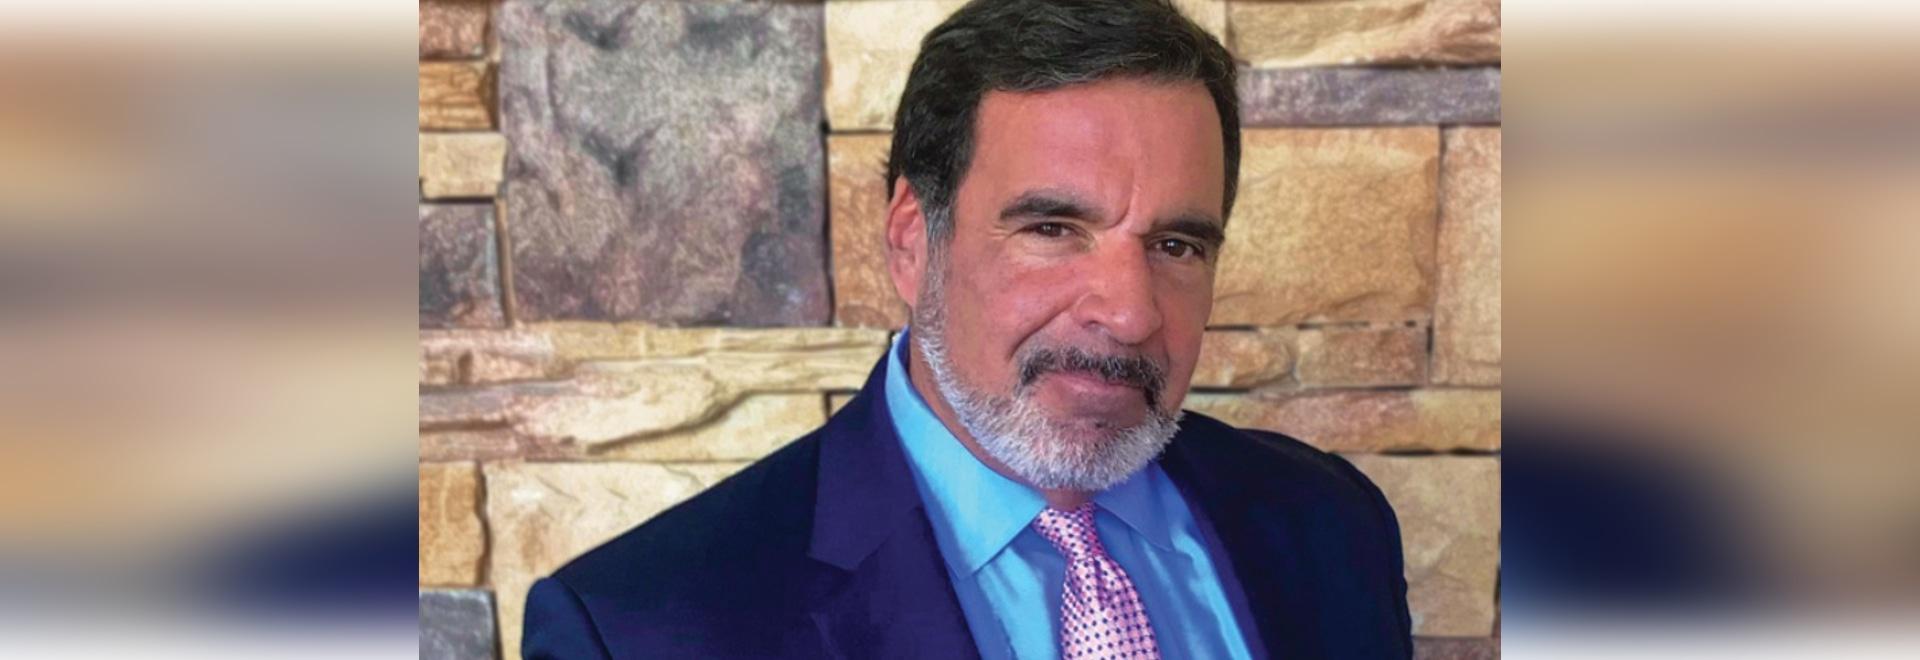 Robert Hariri